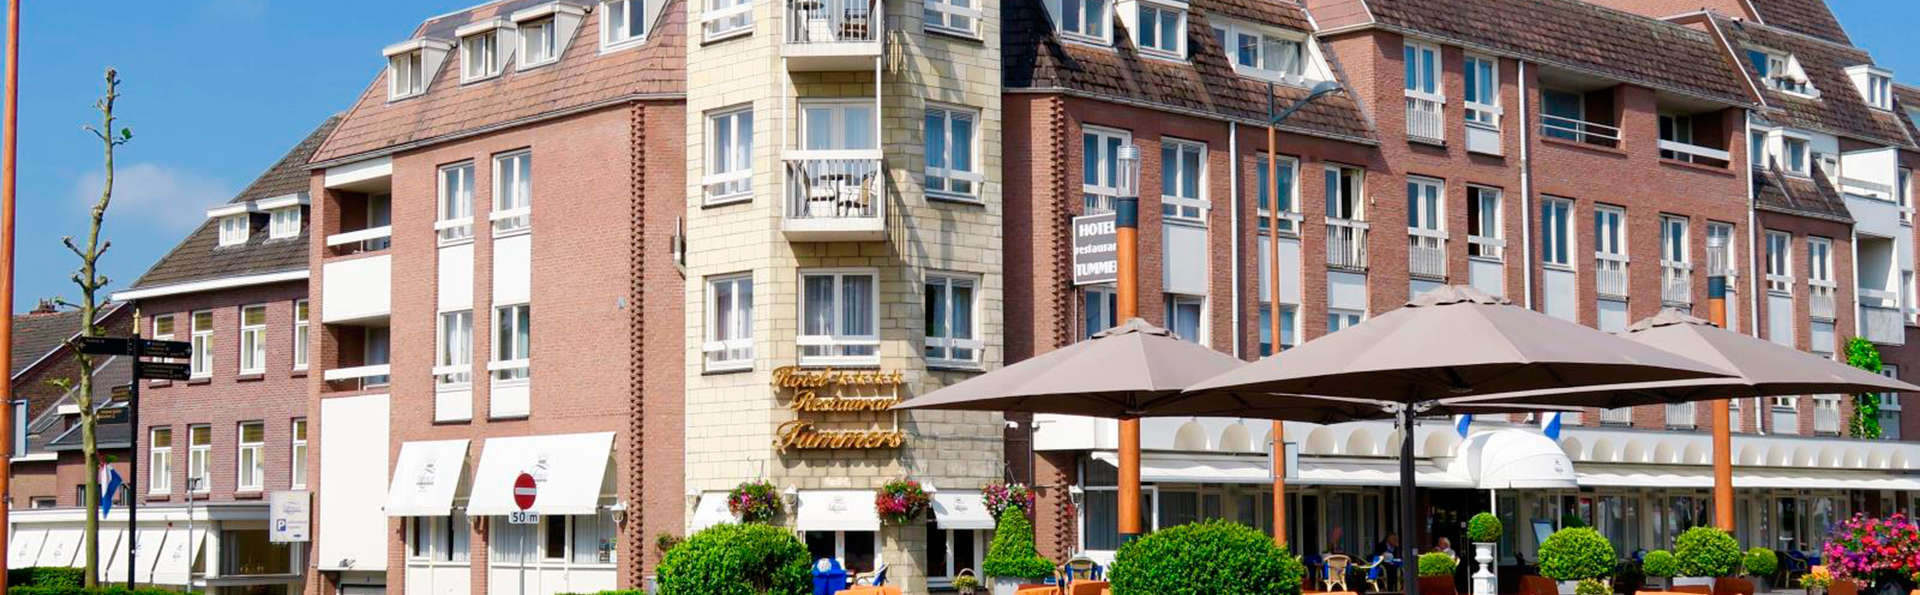 Hotel & Restaurant Tummers - EDIT_front2.jpg